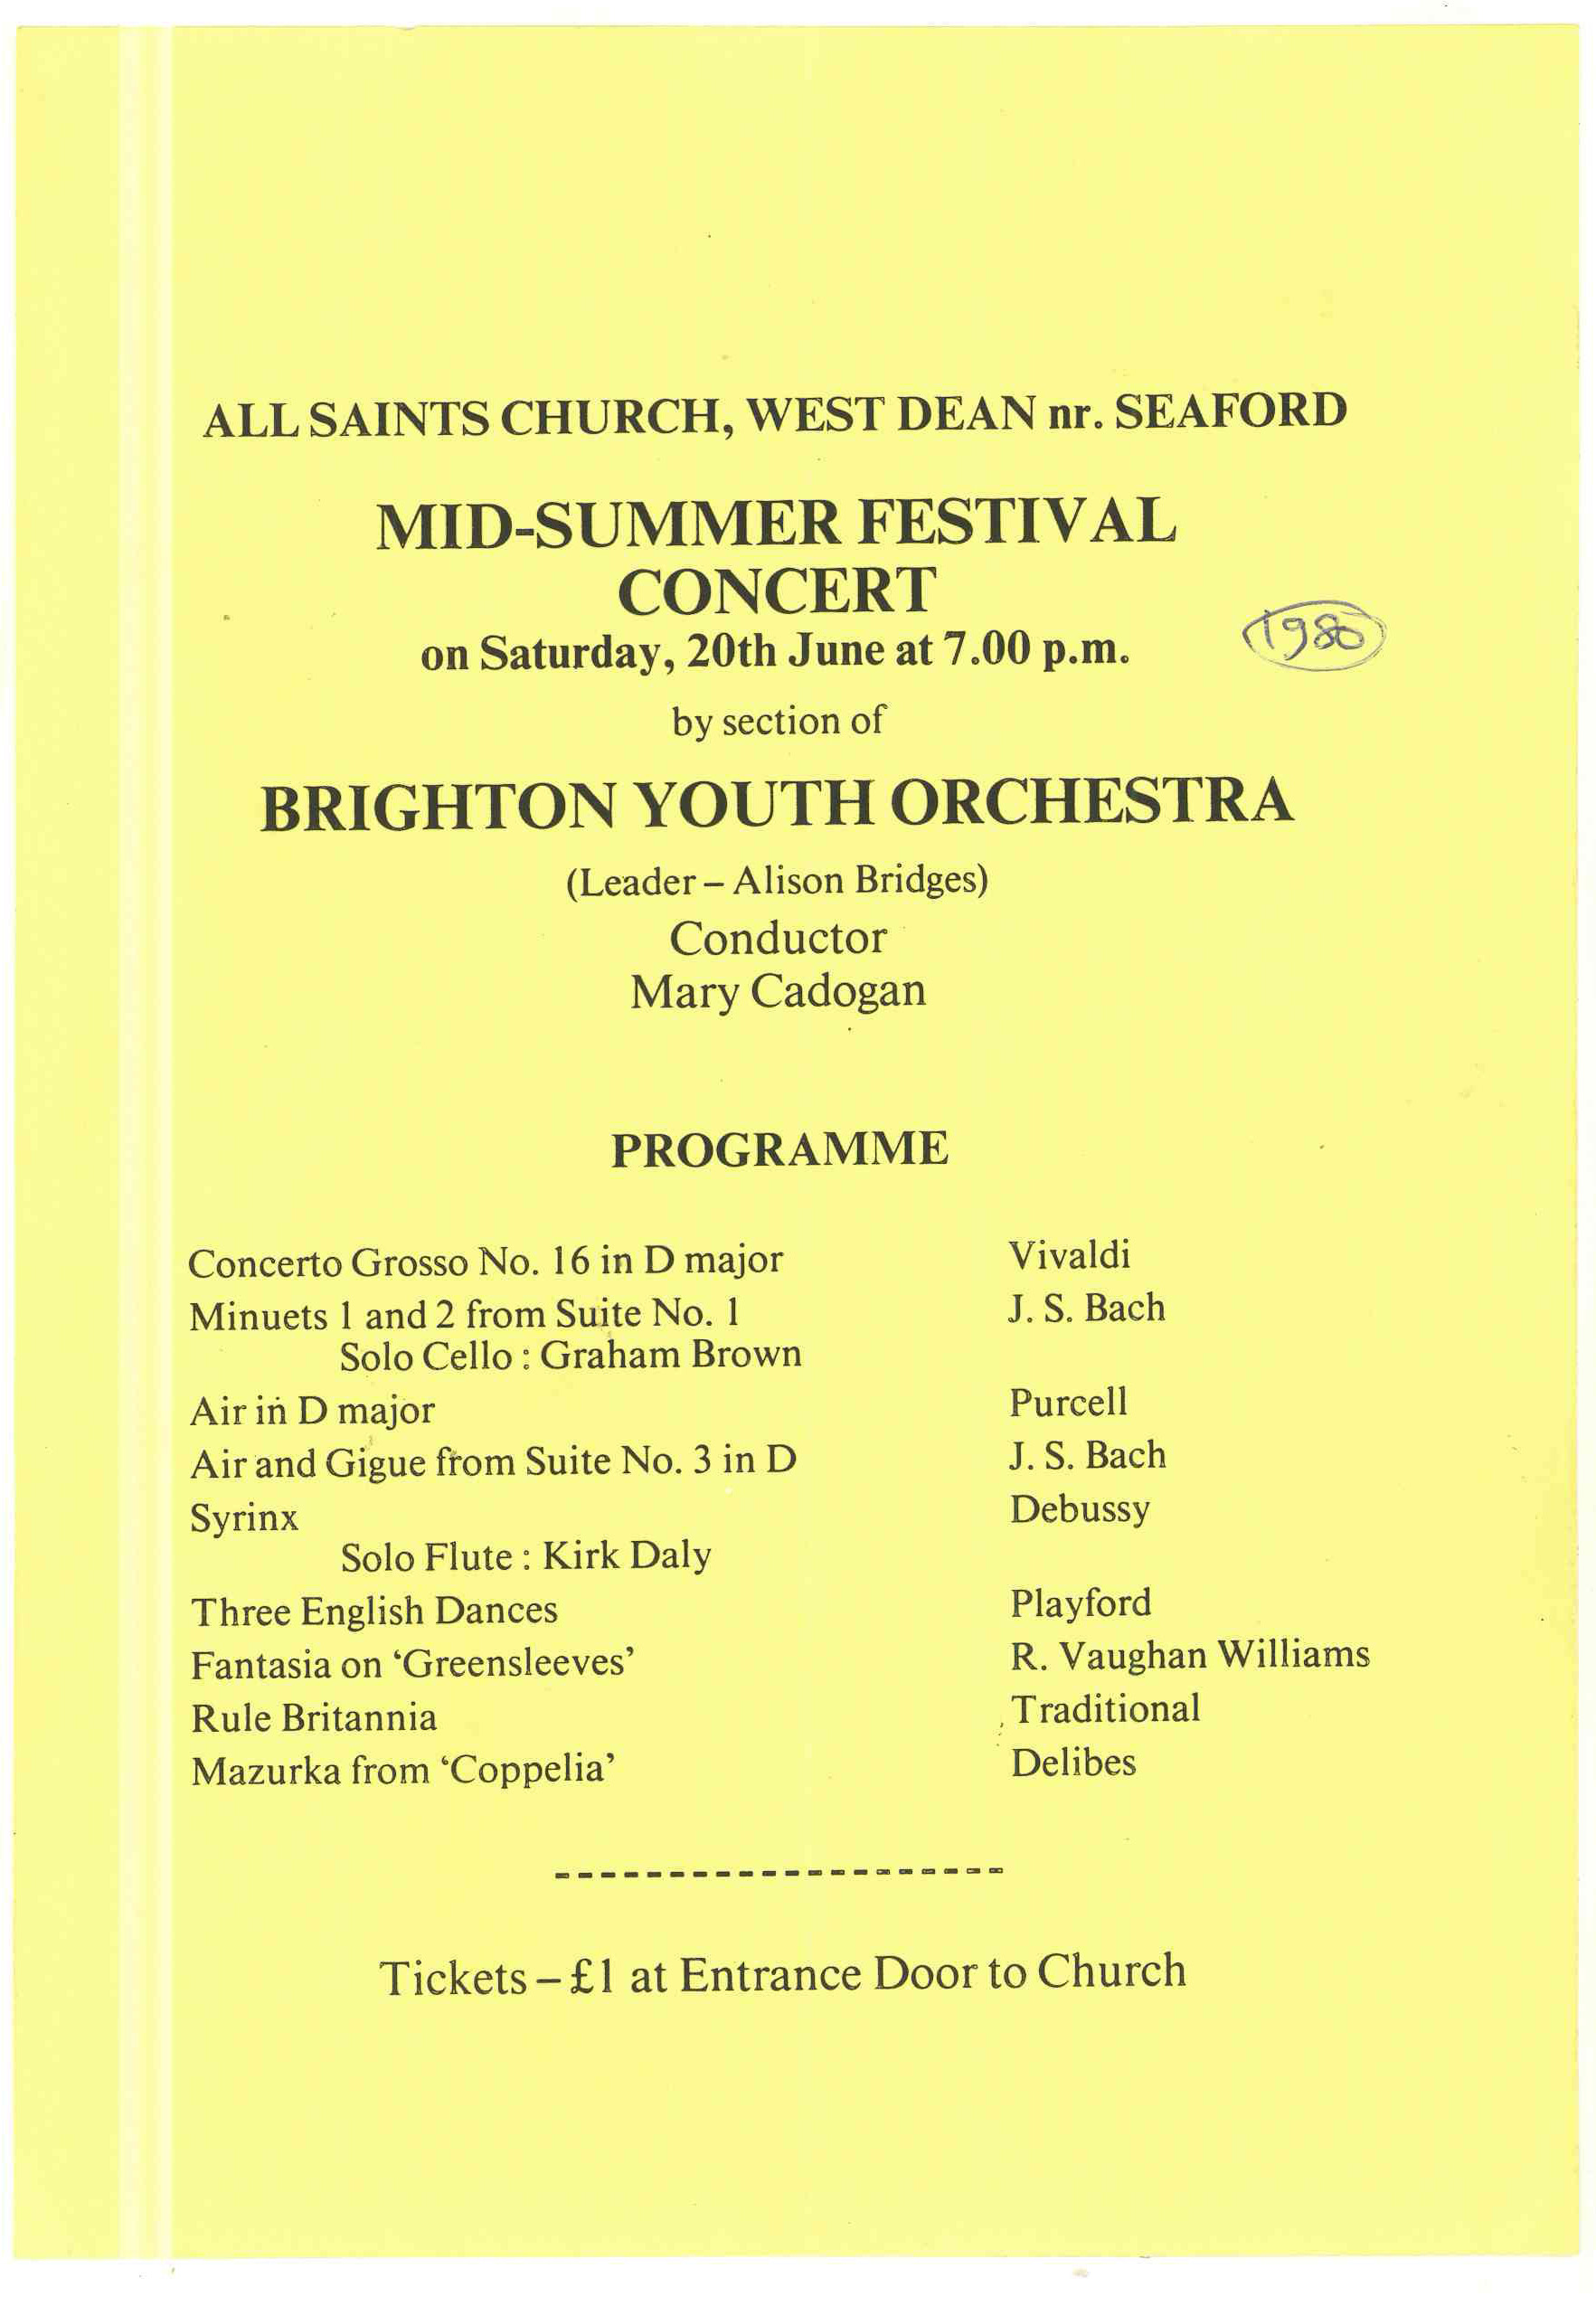 00176-BYO All Saints Church 20th June 1980.jpg